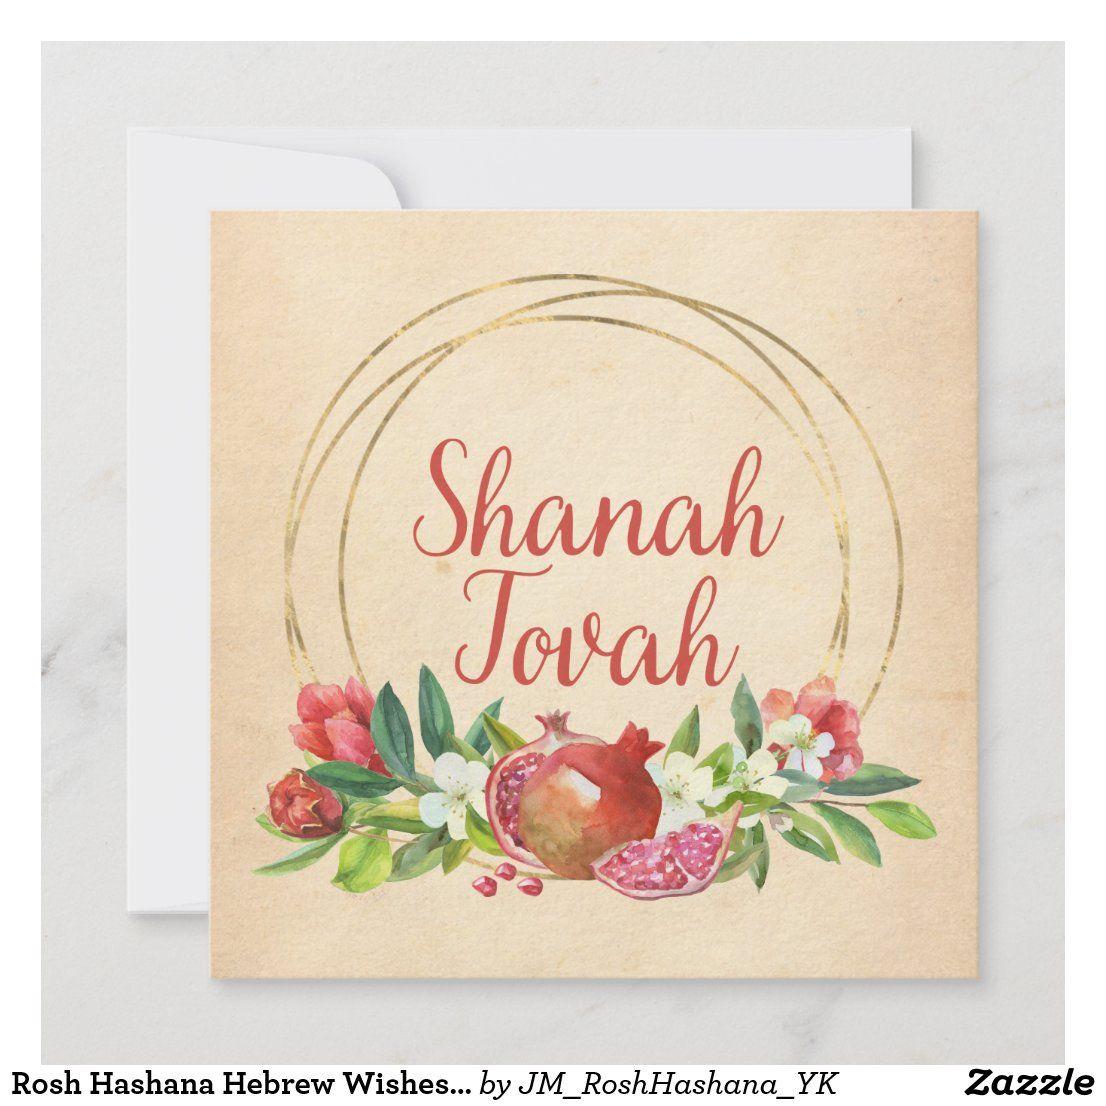 Rosh Hashana Hebrew Wishes Shanah Tovah Holiday Card